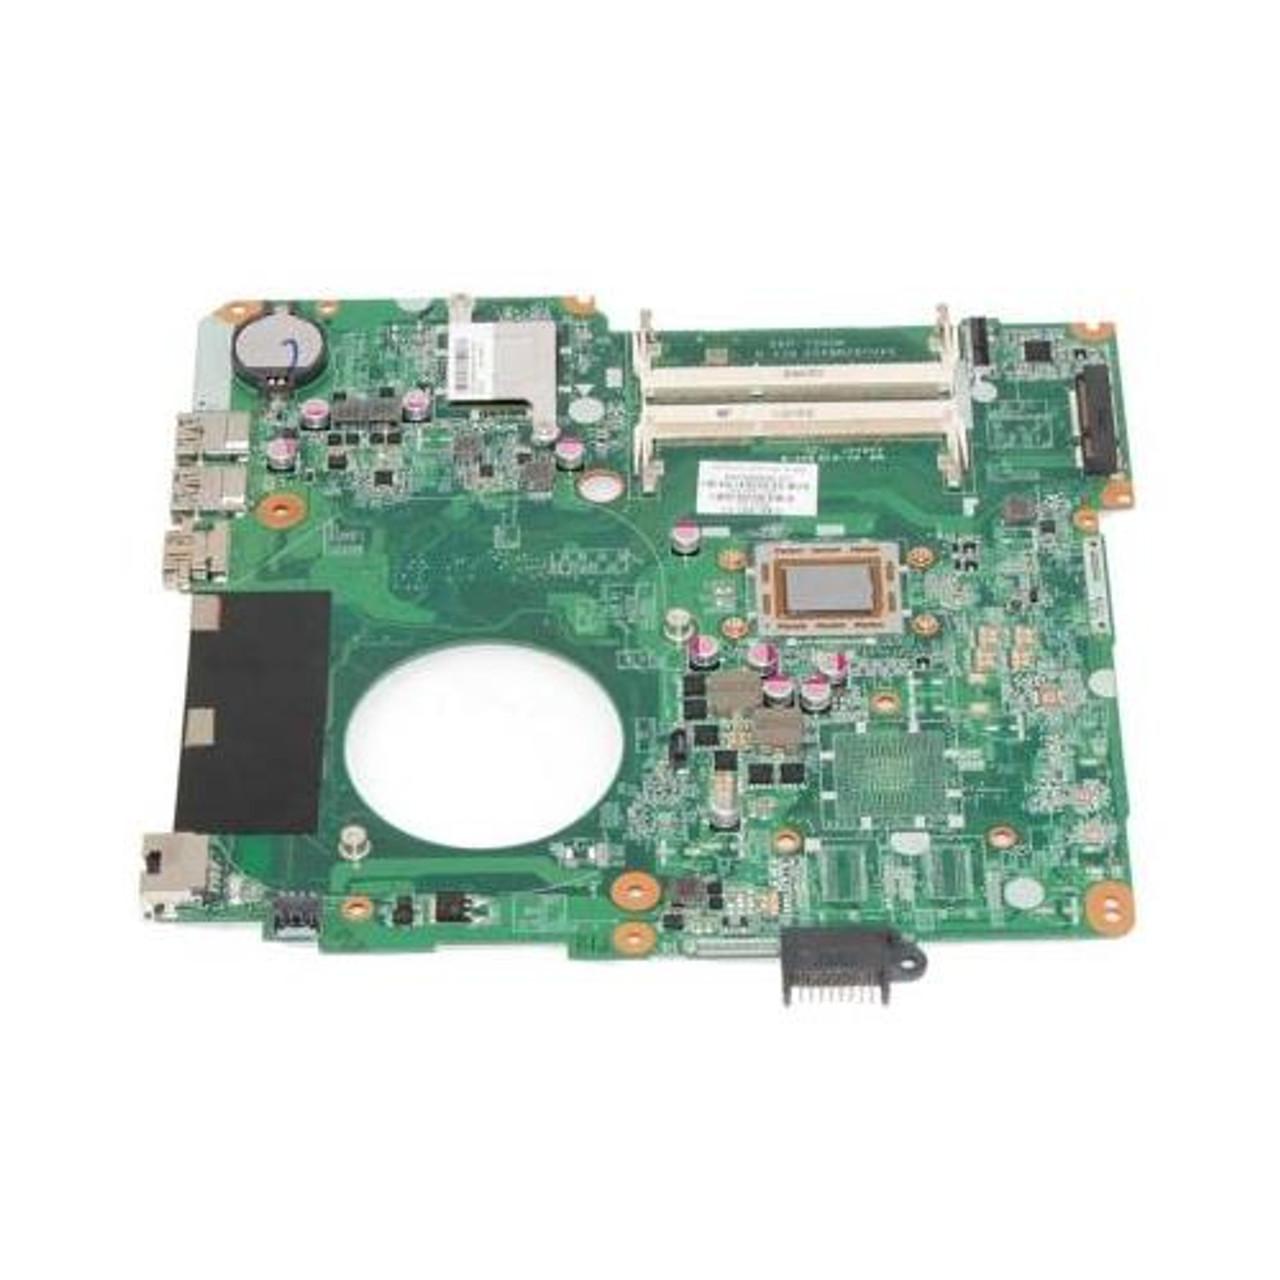 HP Pavilion 14-V Laptop Motherboard w// AMD A10-5745M 2.1Ghz CPU 763550-501